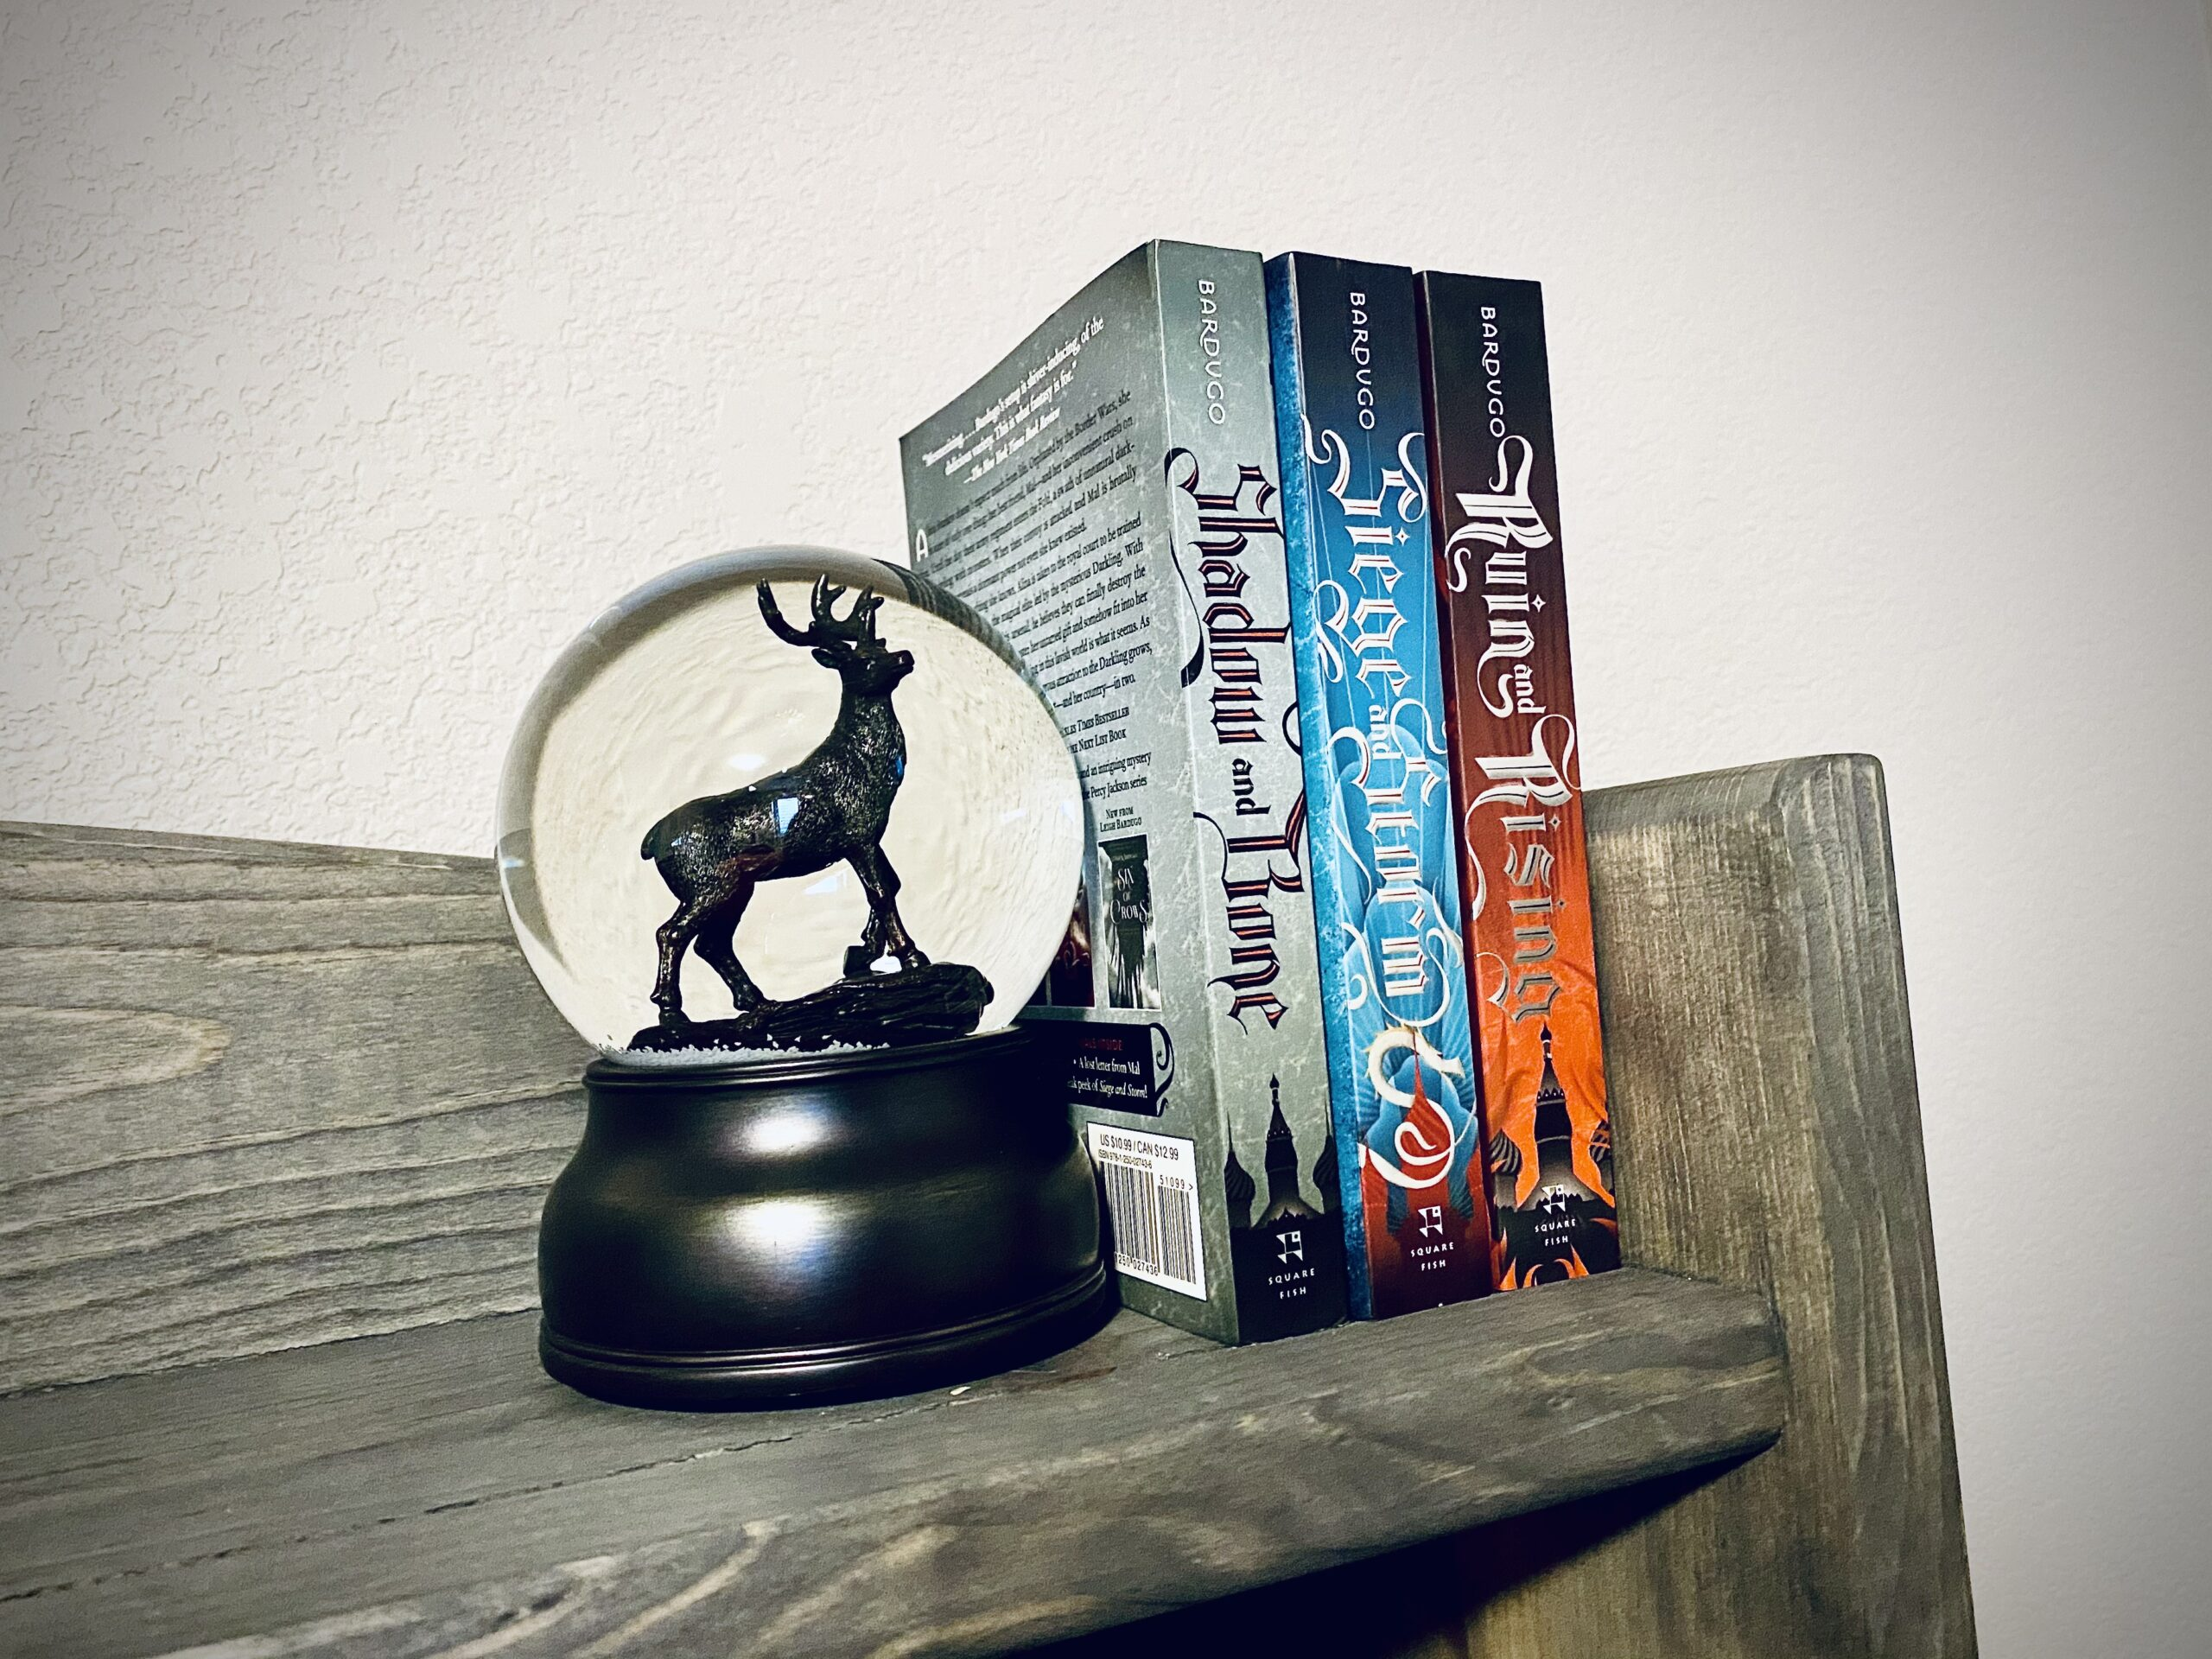 shadow and bone, nettxlix, grisha trilogy, ya fantasy, books, reading, movies based on books, 2021, films